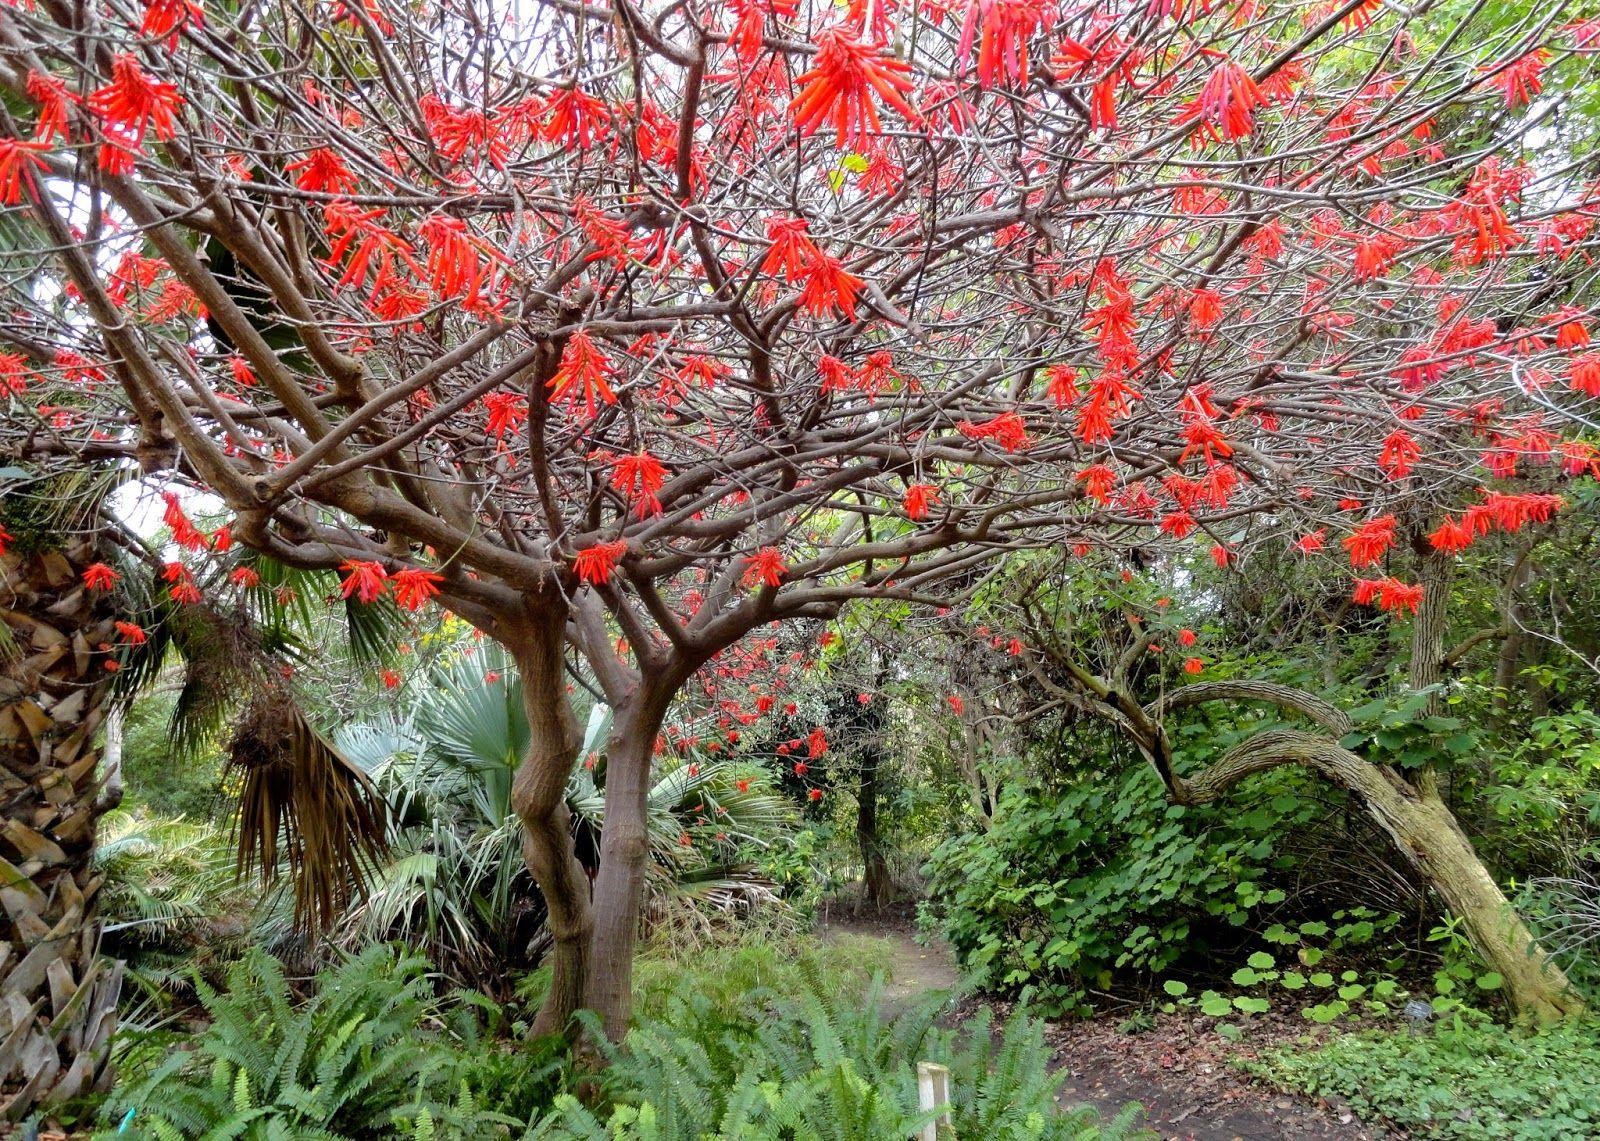 cd222ee474b5adba057d896822814f3d - San Diego Botanical Gardens Free Tuesday